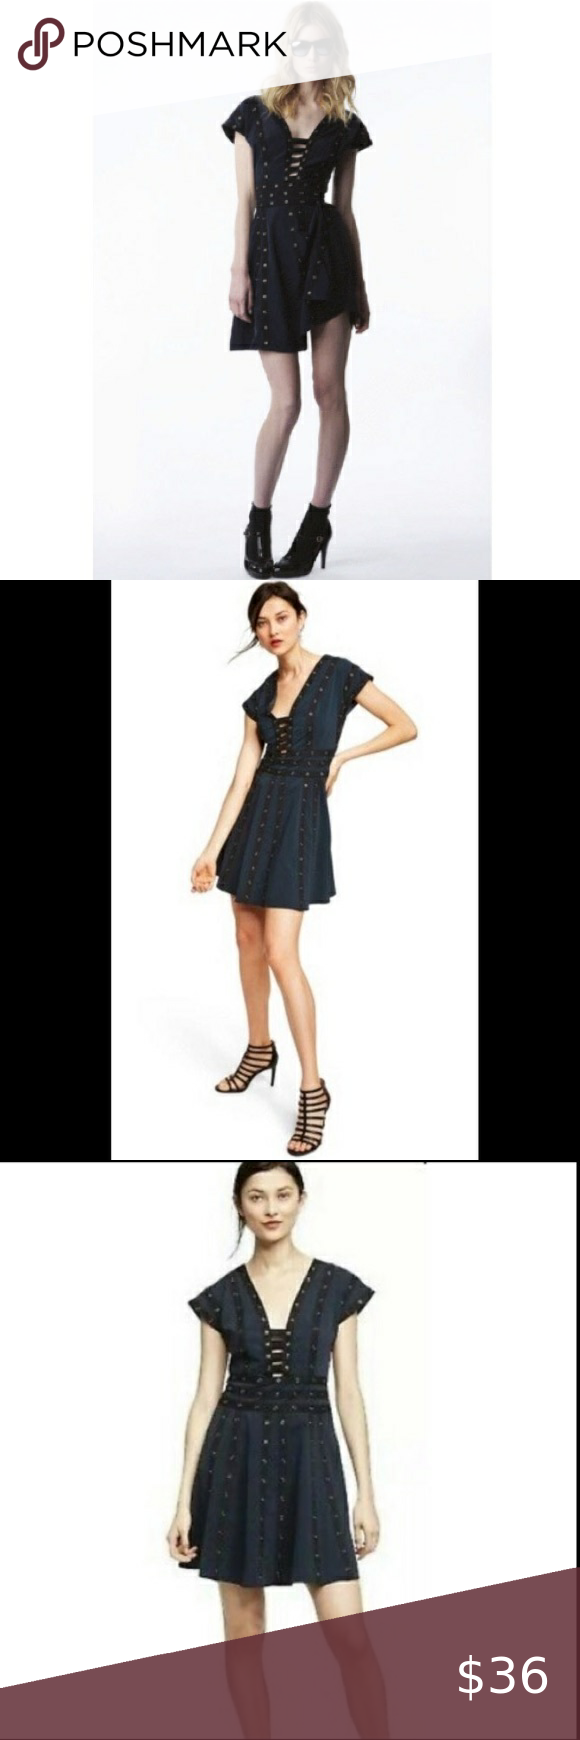 Zac Posen For Target Snap Dress In 2021 Zac Posen Cocktail Dress Strapless Dresses Short Asymmetrical Black Dress [ 1740 x 580 Pixel ]